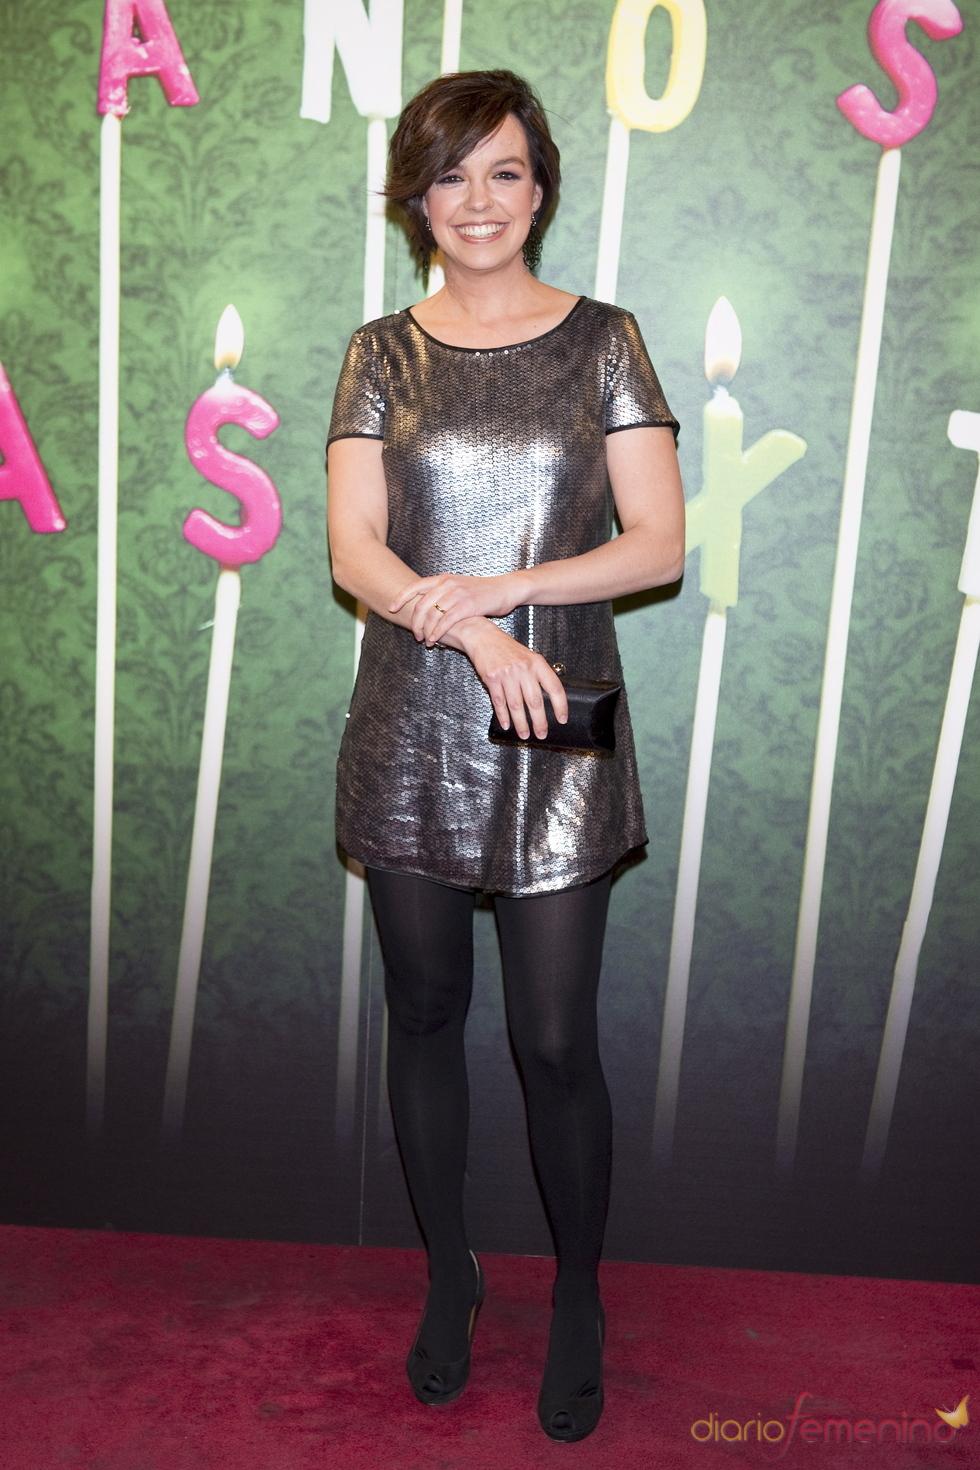 Cristina Villanueva en la fiesta del 5º aniversario de 'La Sexta'